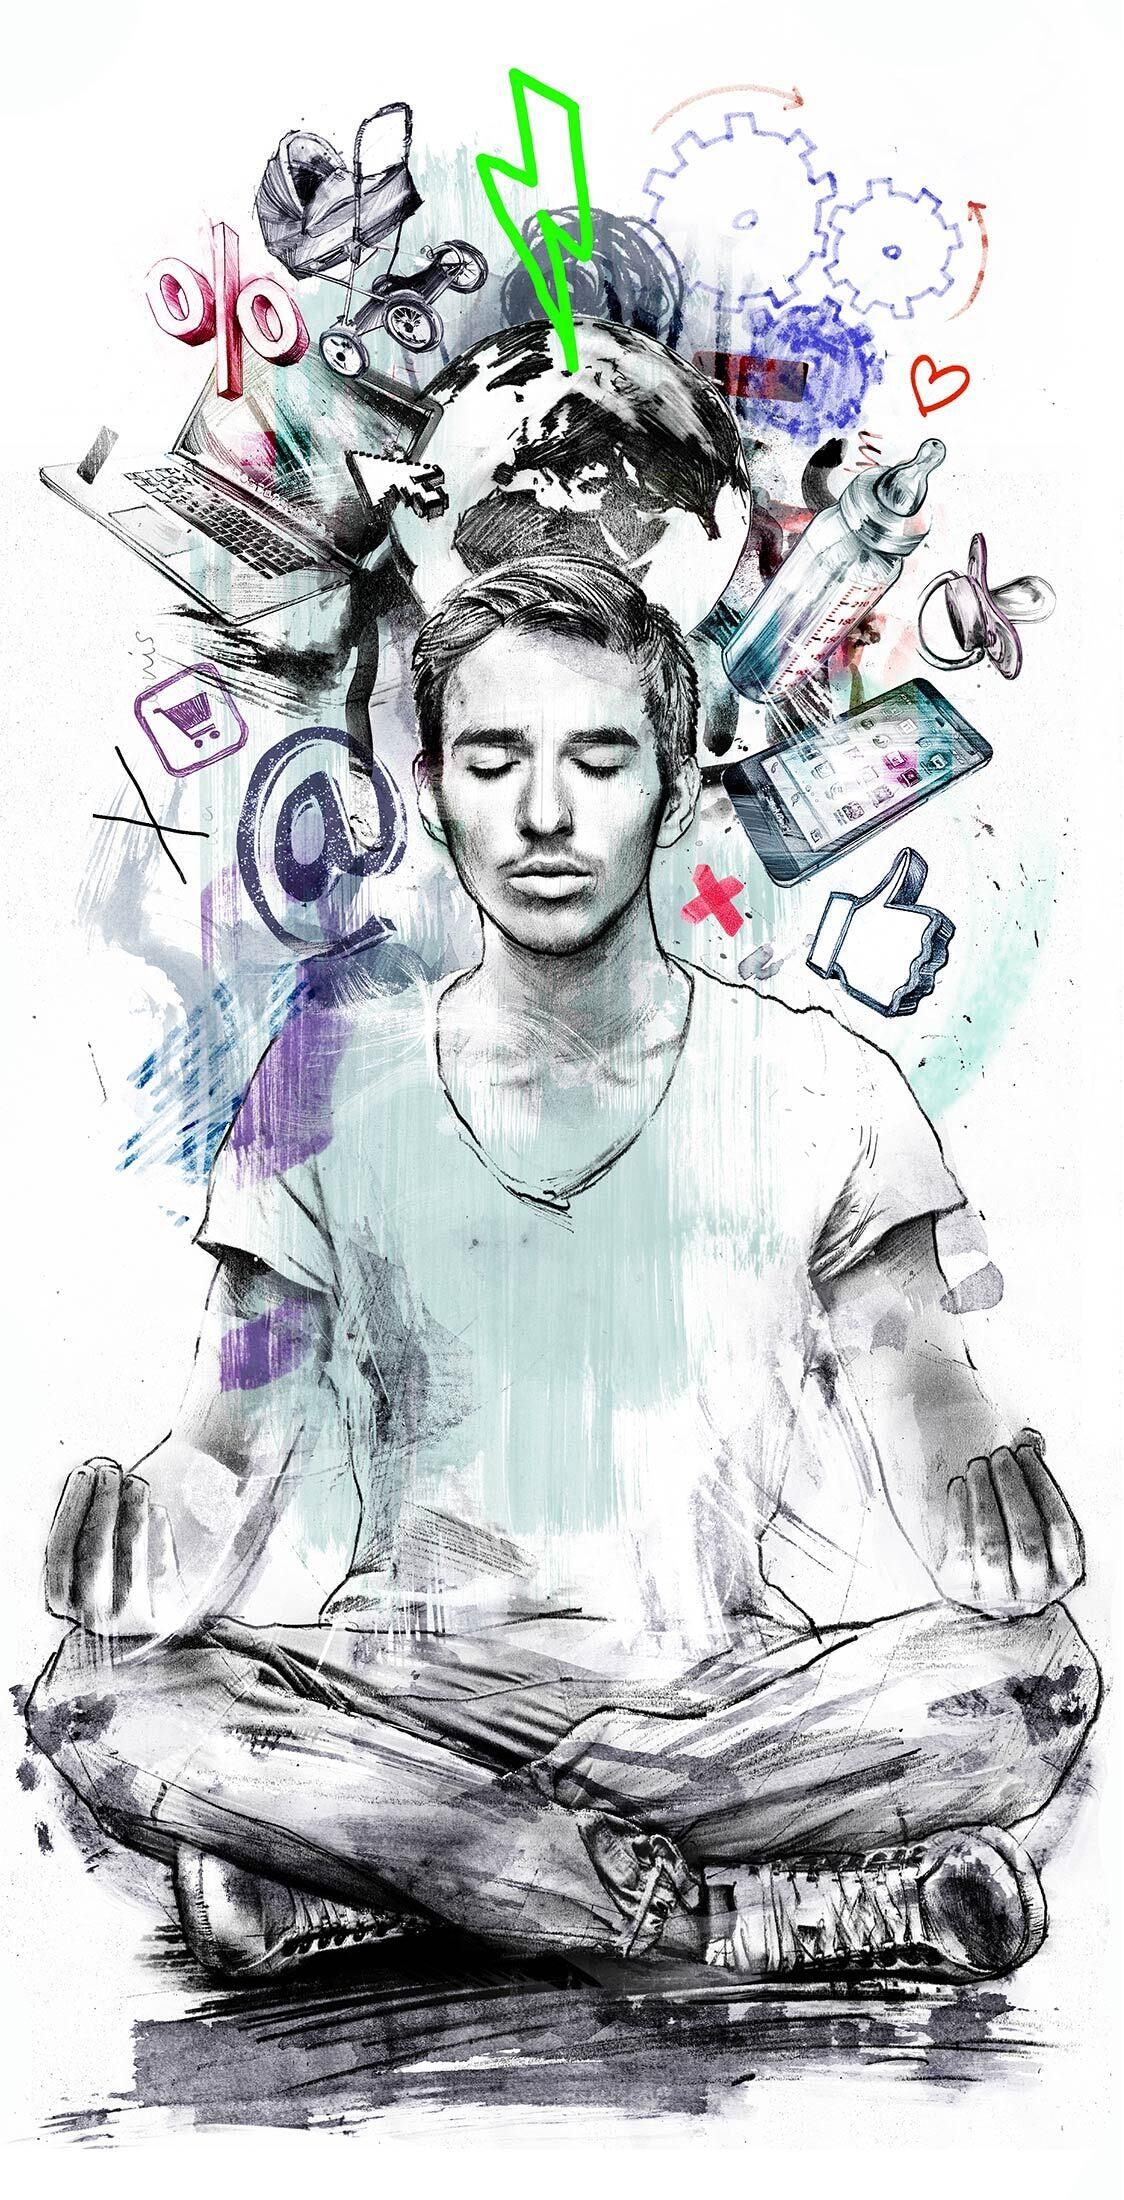 Stress youth editorial illustration - Kornel Illustration | Kornel Stadler portfolio